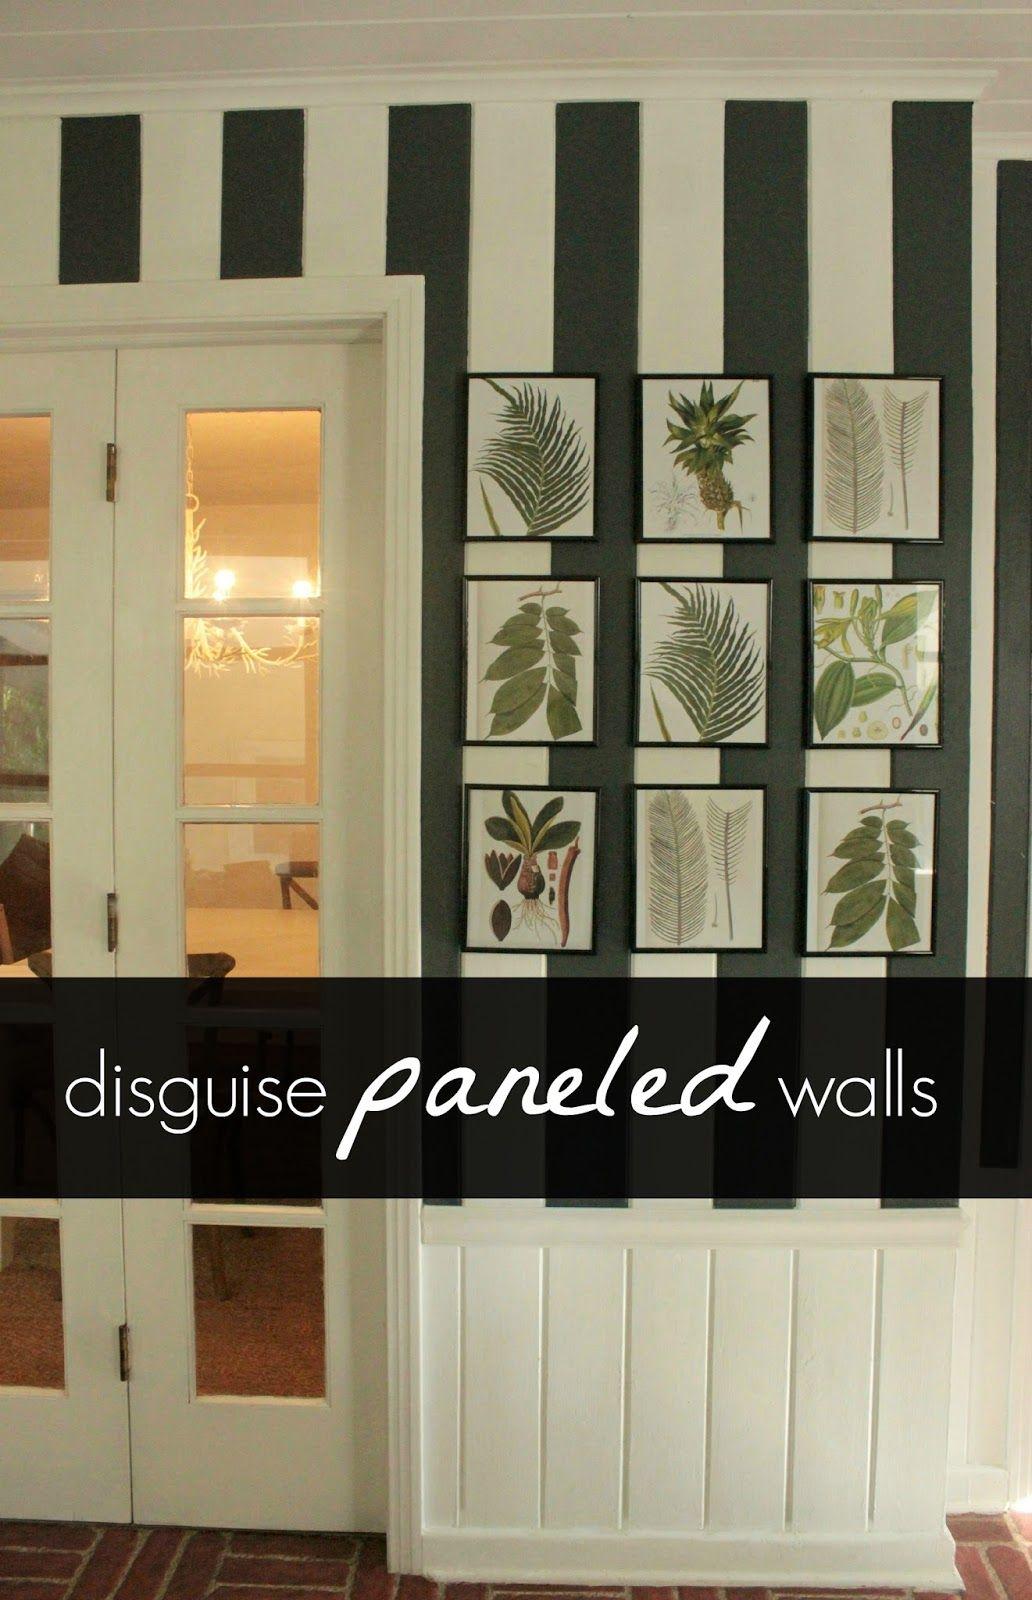 Disguise Paneled Walls Painted Paneling Walls Wall Paneling